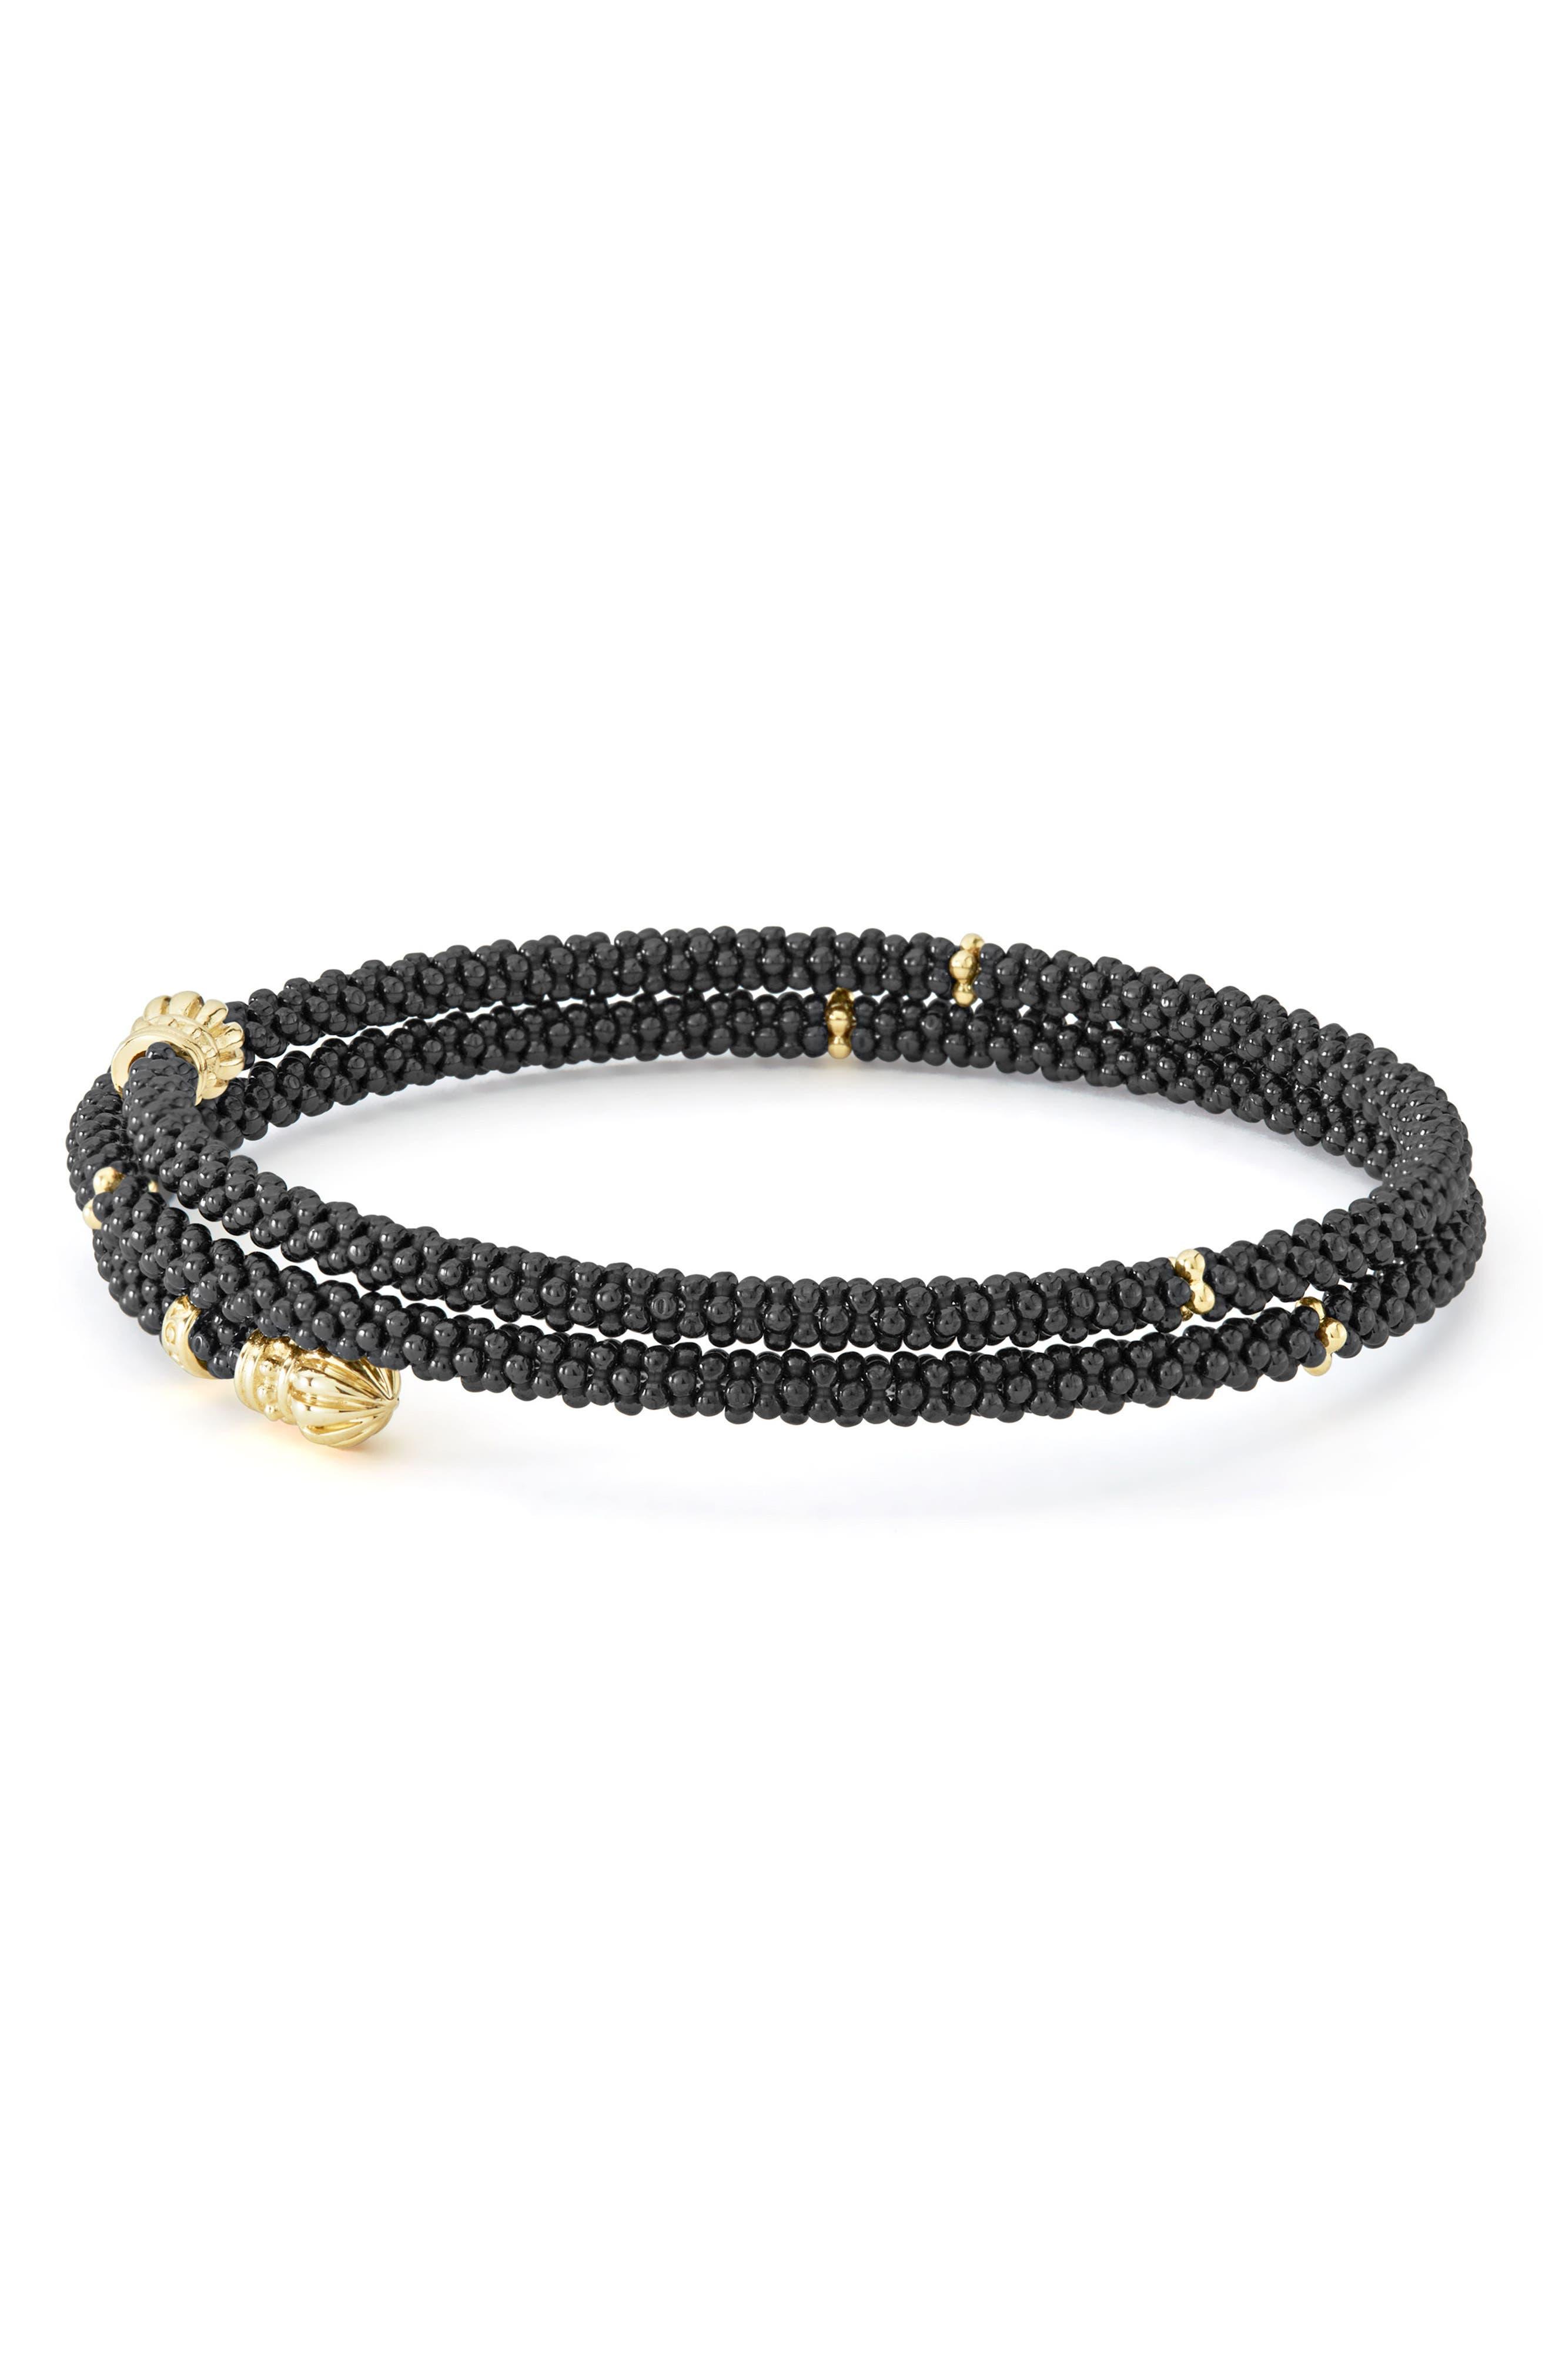 Gold & Black Caviar Coil Bracelet,                             Alternate thumbnail 4, color,                             GOLD